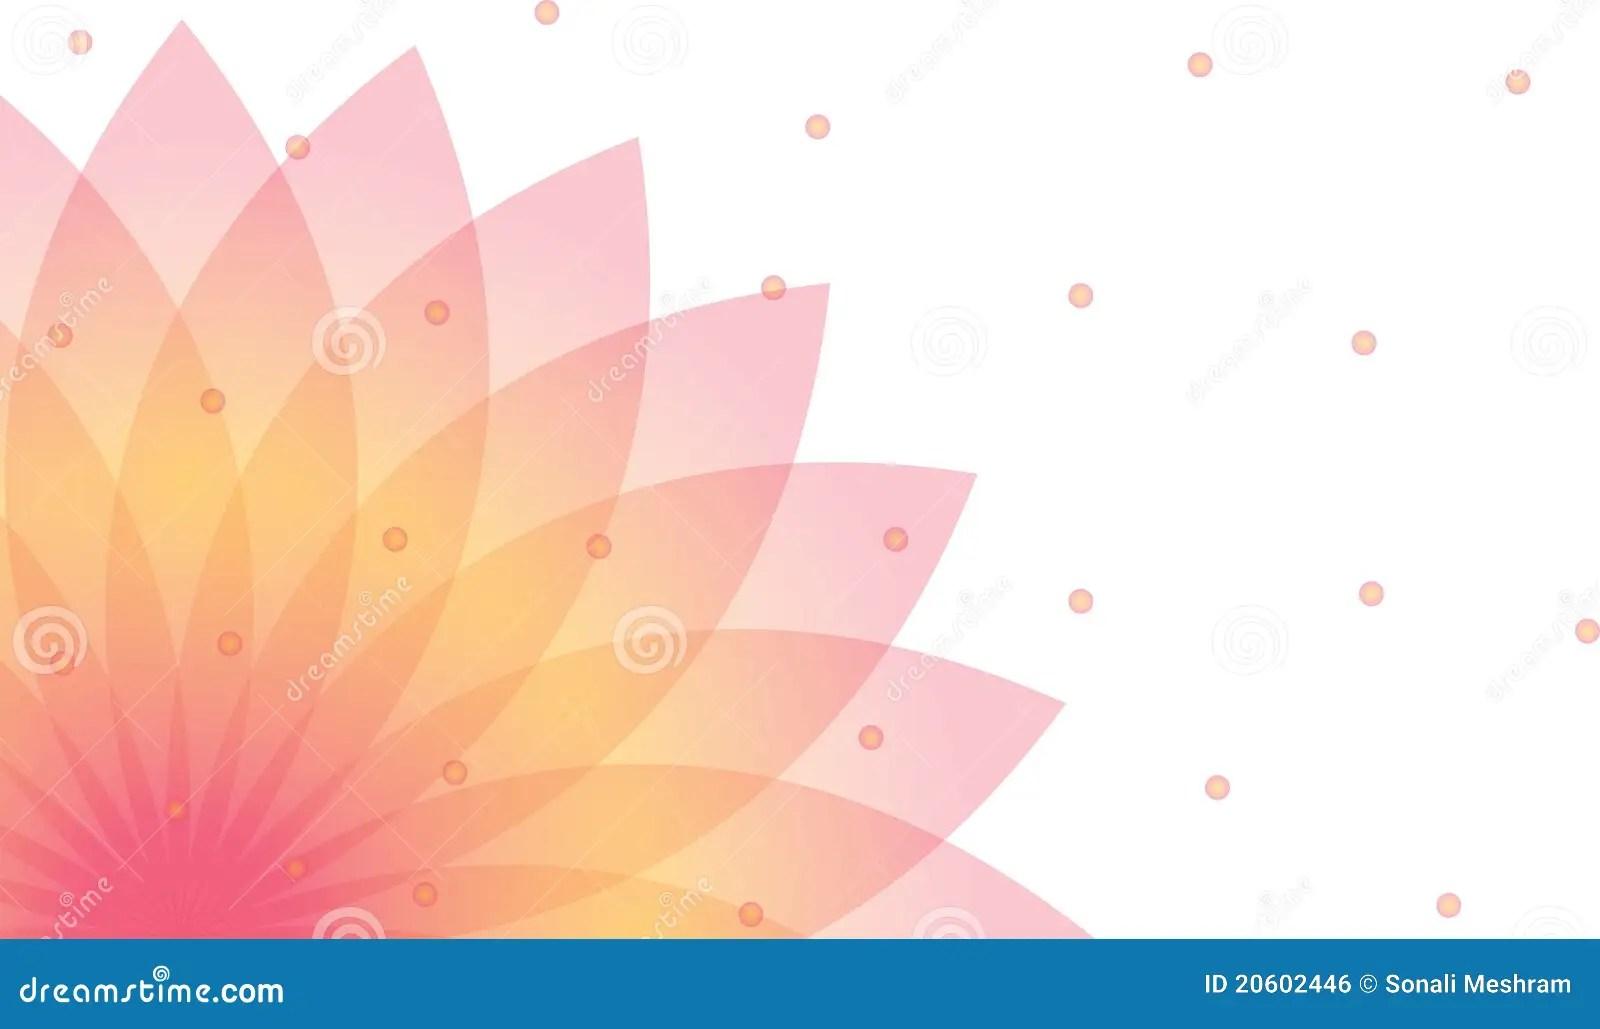 Cute Buddha Wallpaper Lotus Background Stock Vector Illustration Of Medical